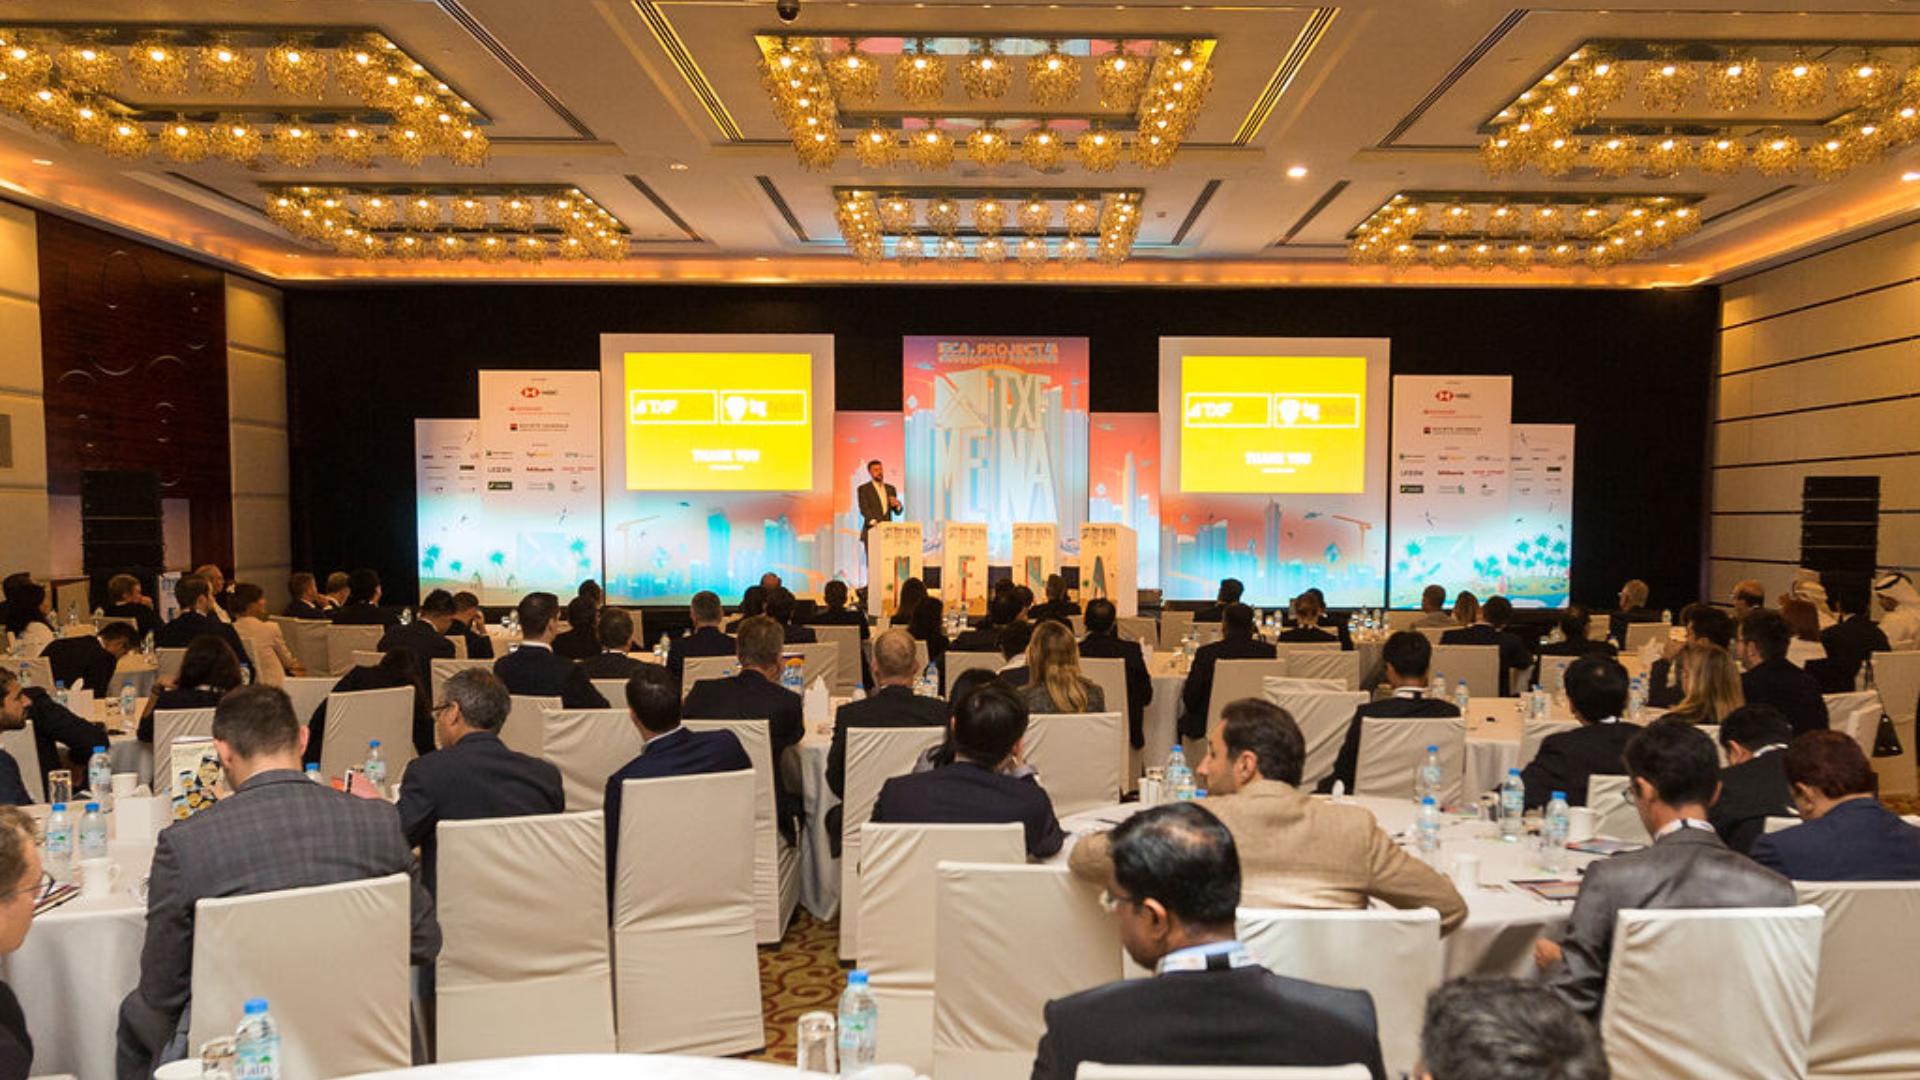 Mechanisms of policy: Regulation forum